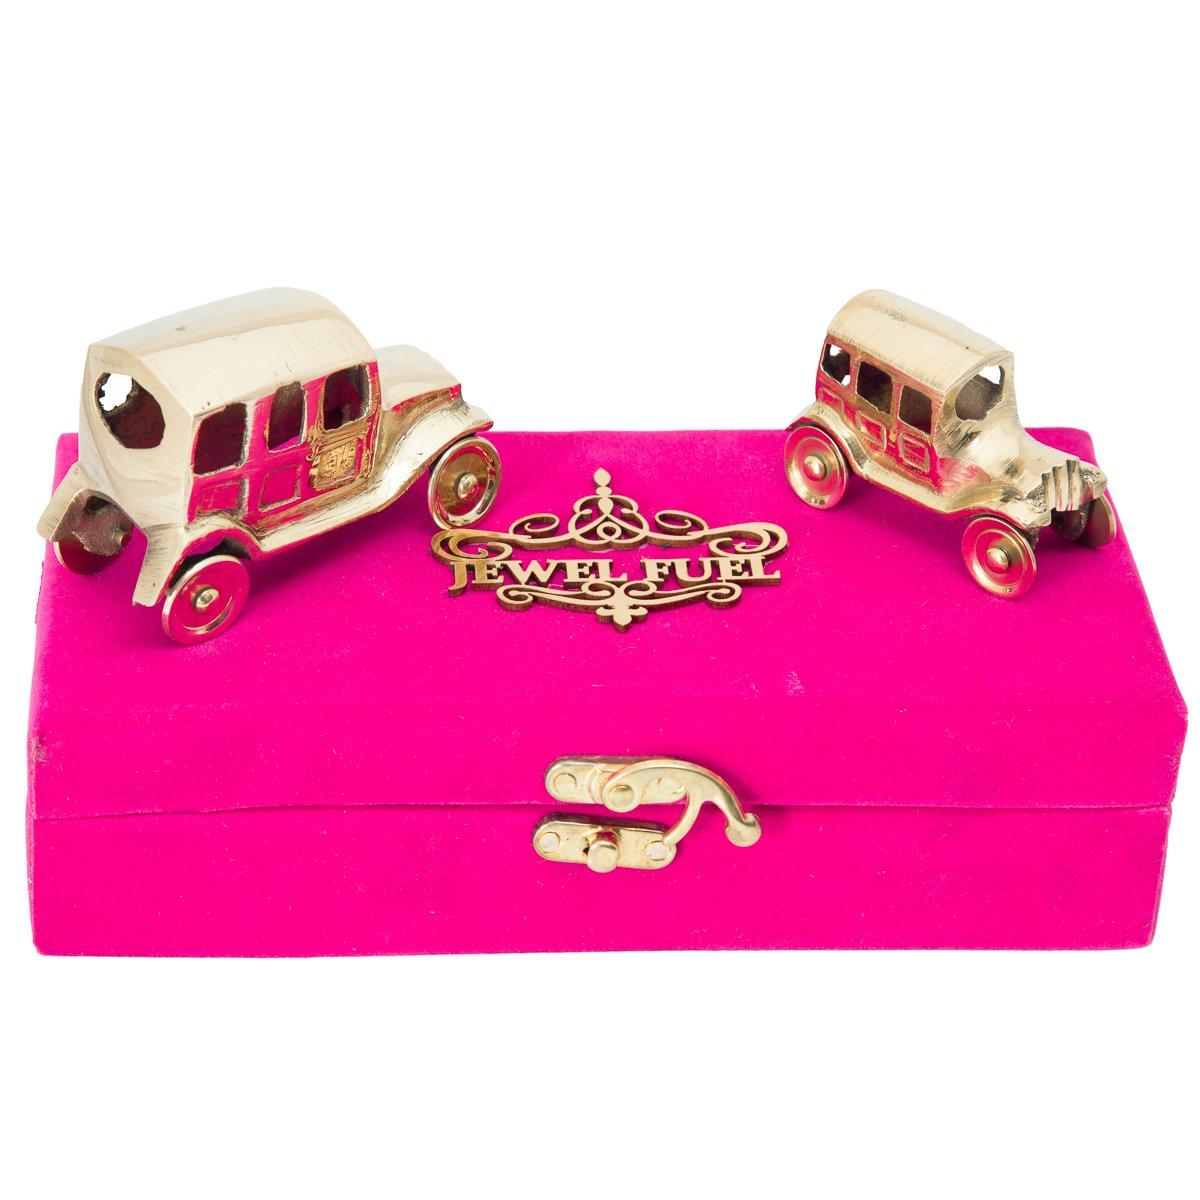 JEWEL FUEL Brass Antique 2 Vintage Car Showpiece Gift Set  45ad3ec4f2c24